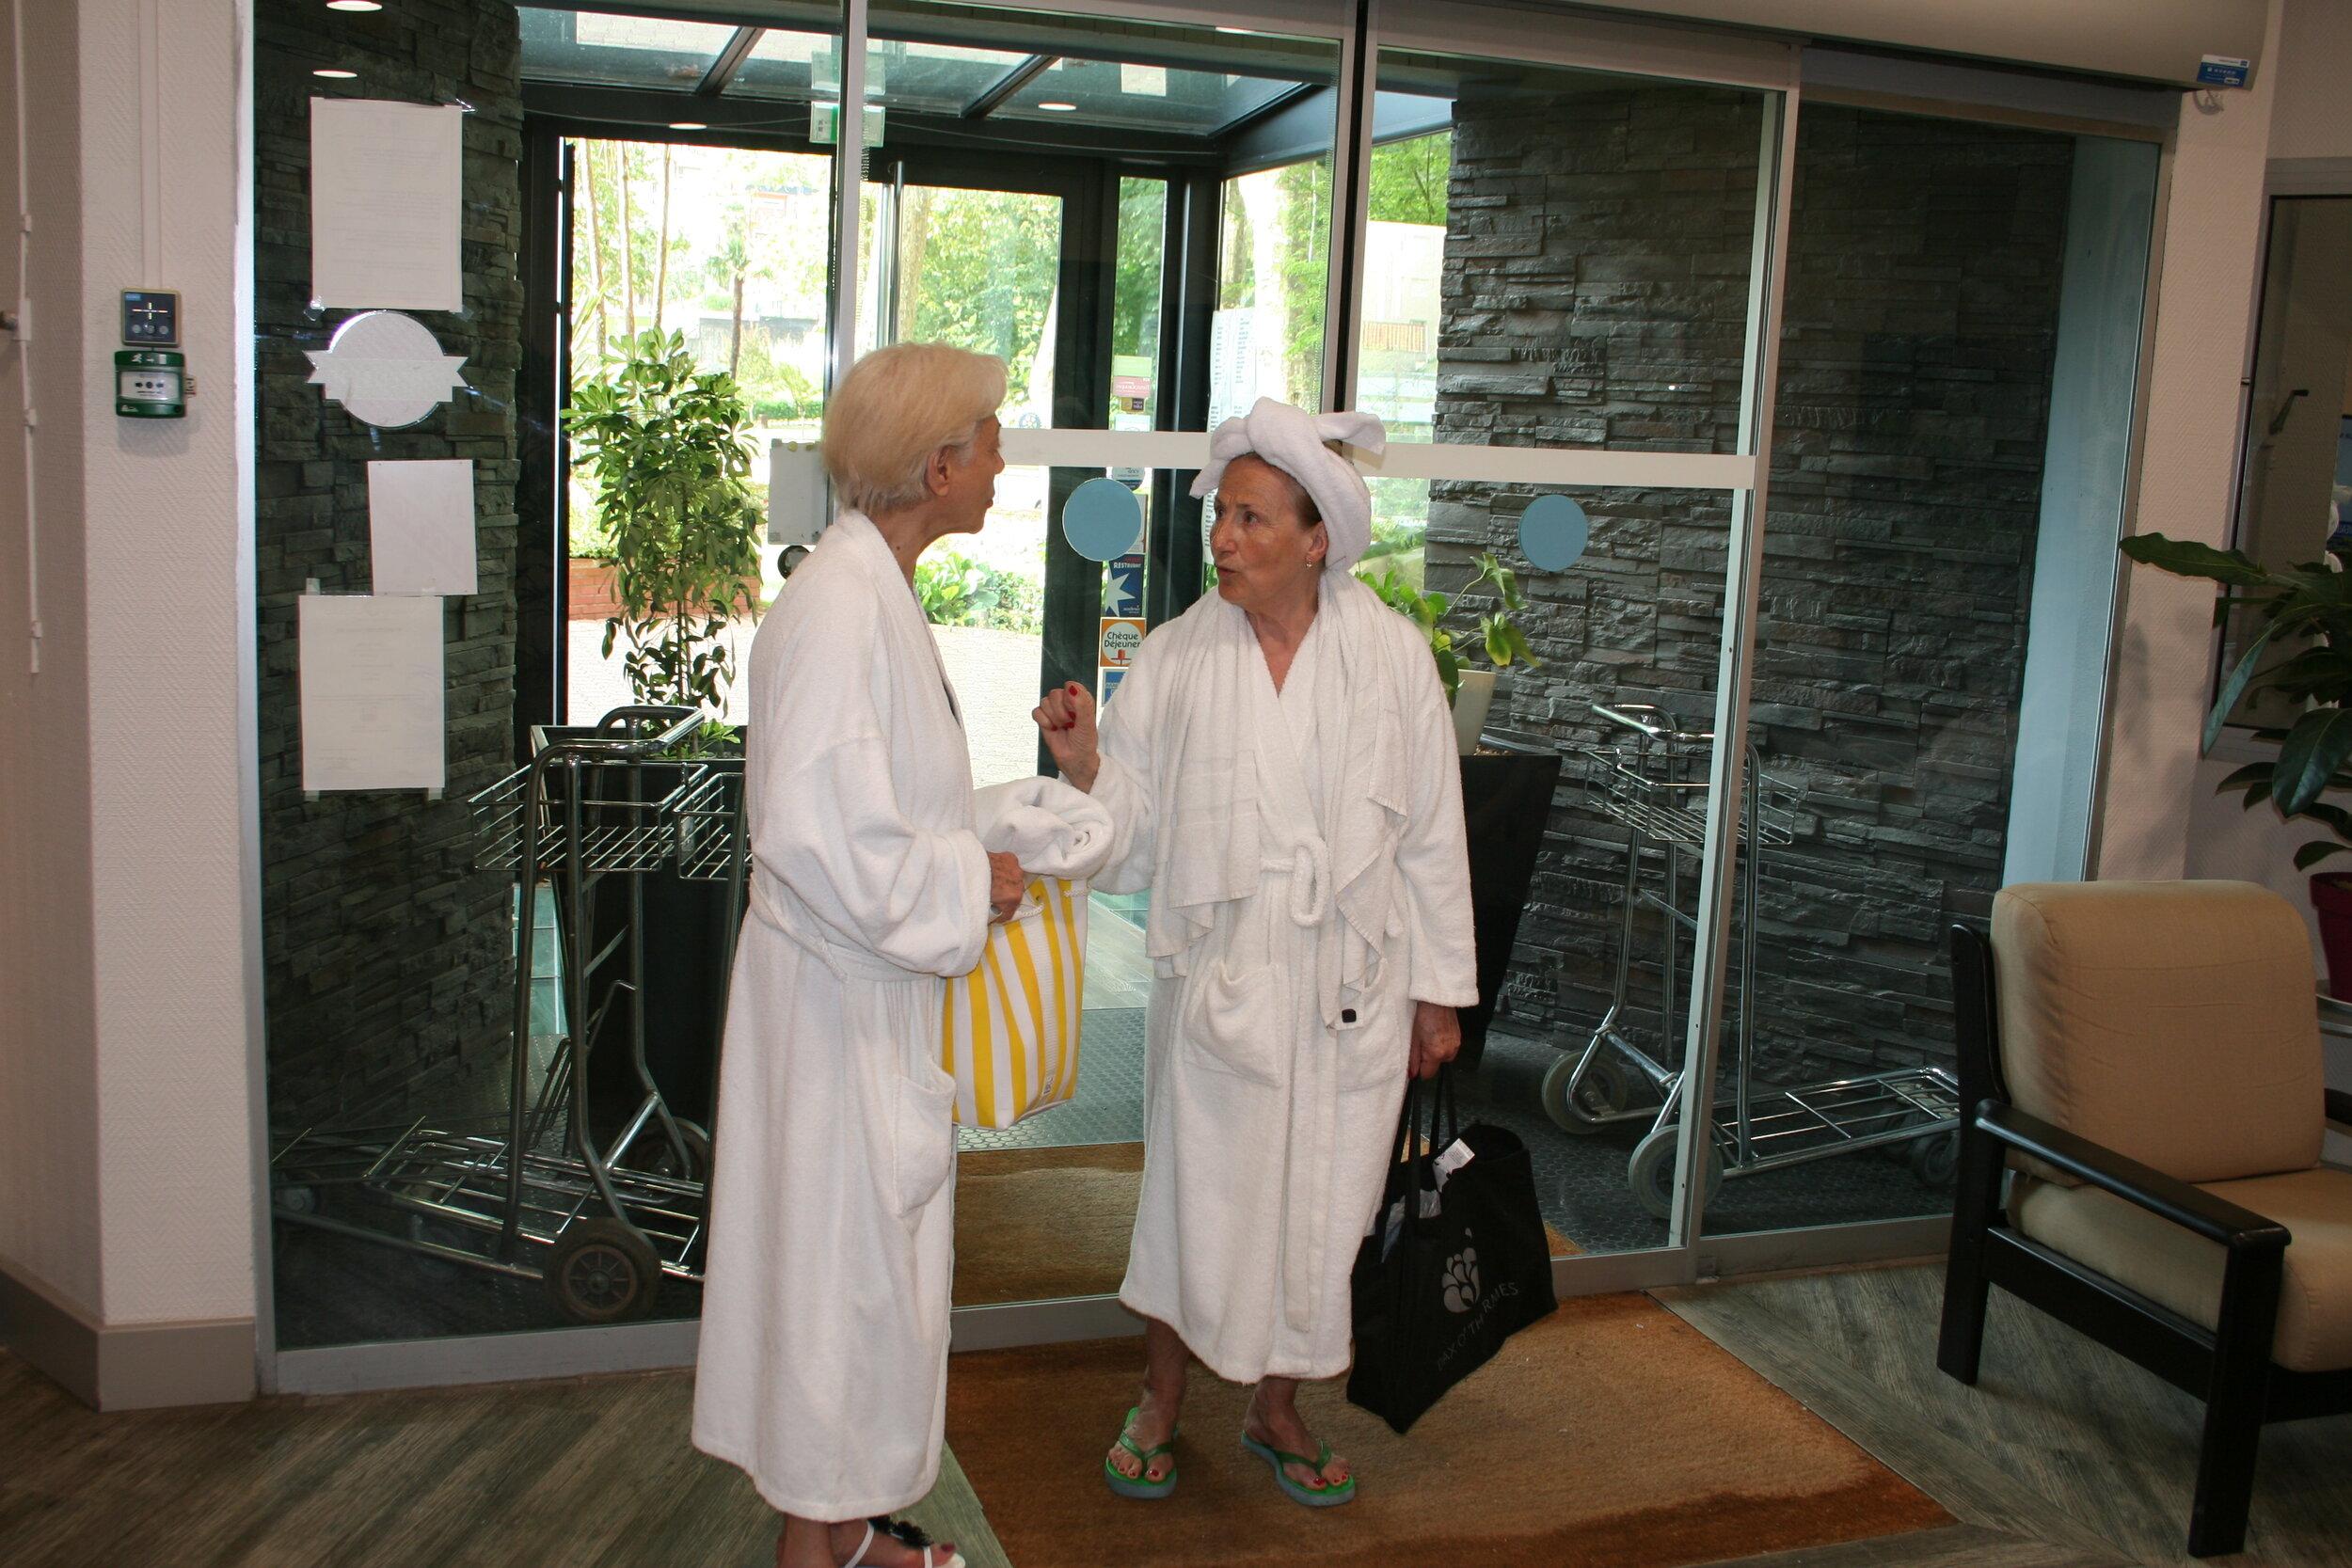 Accès direct établissement thermal dax hotel